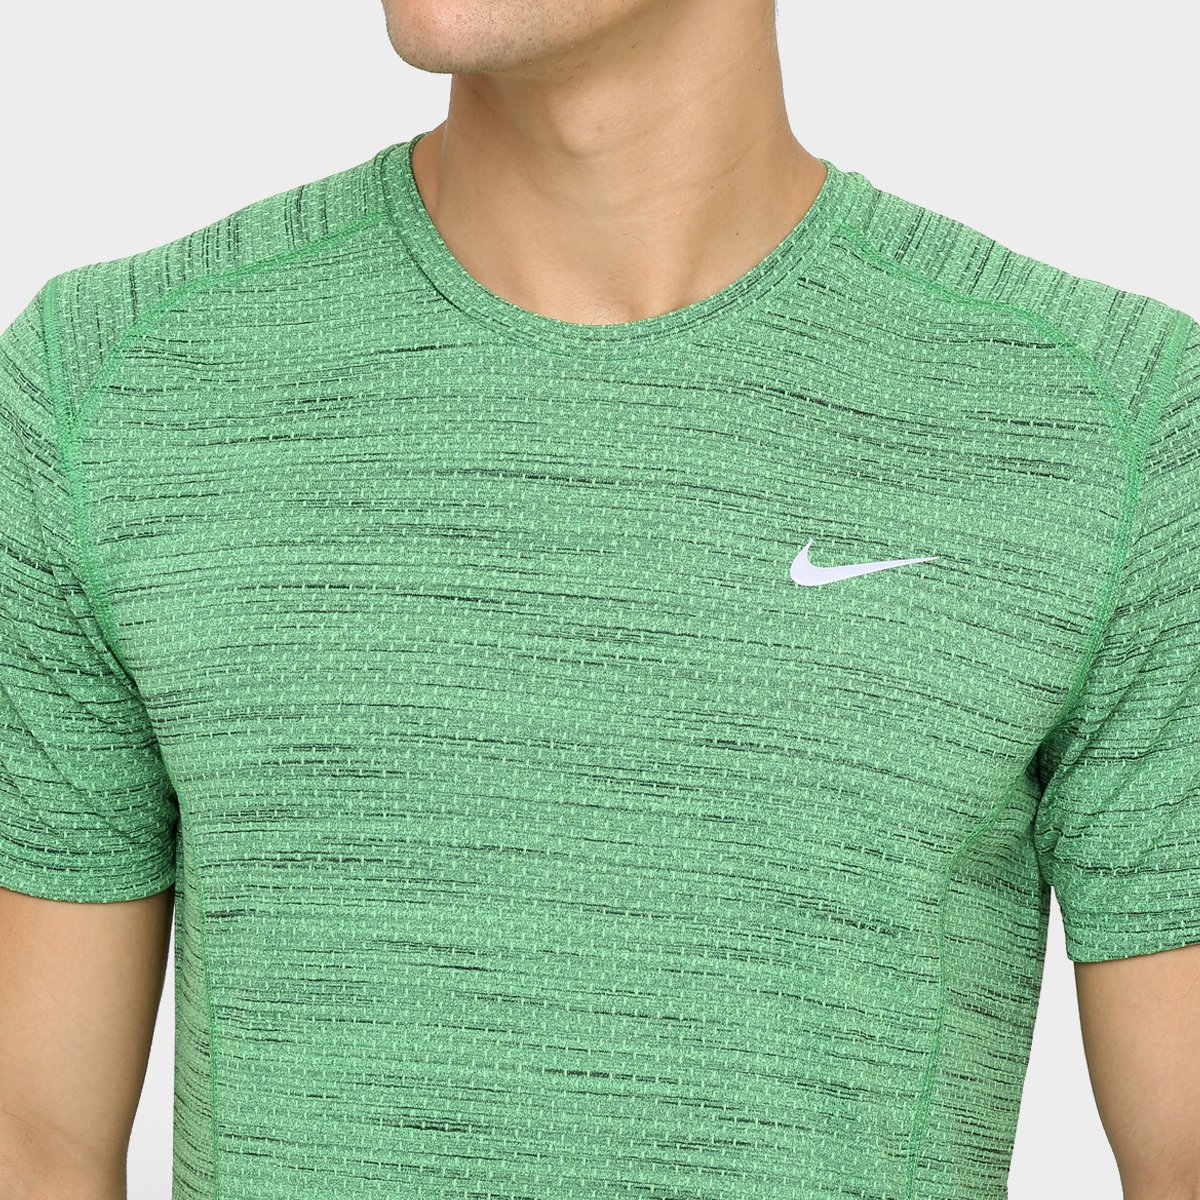 Camiseta Nike Dri-Fit Cool Miler SS - Compre Agora  b8336f619da91